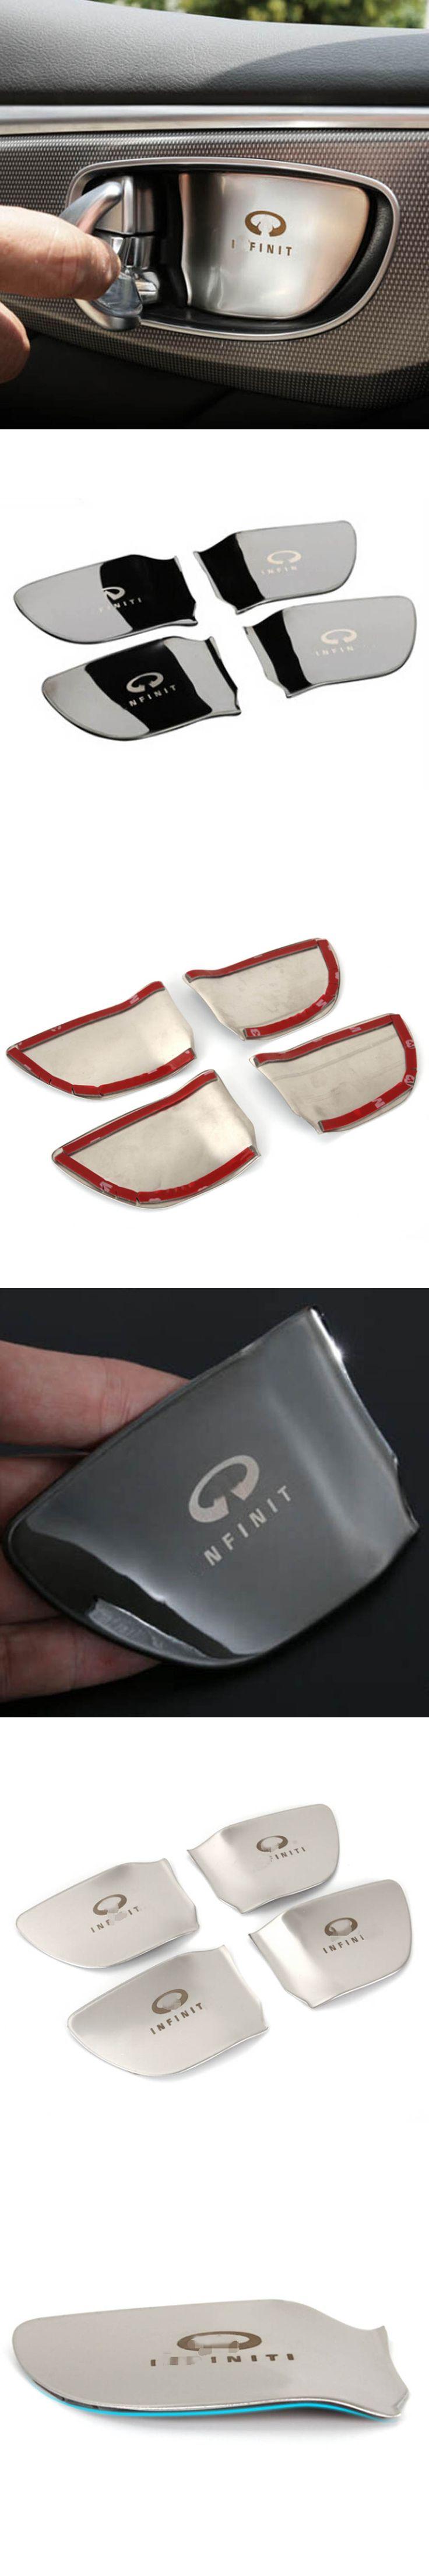 Inner door handle knob bar wrist bowl protective cover sticker trim for infiniti Q50 QX60 Q70 interior accessories